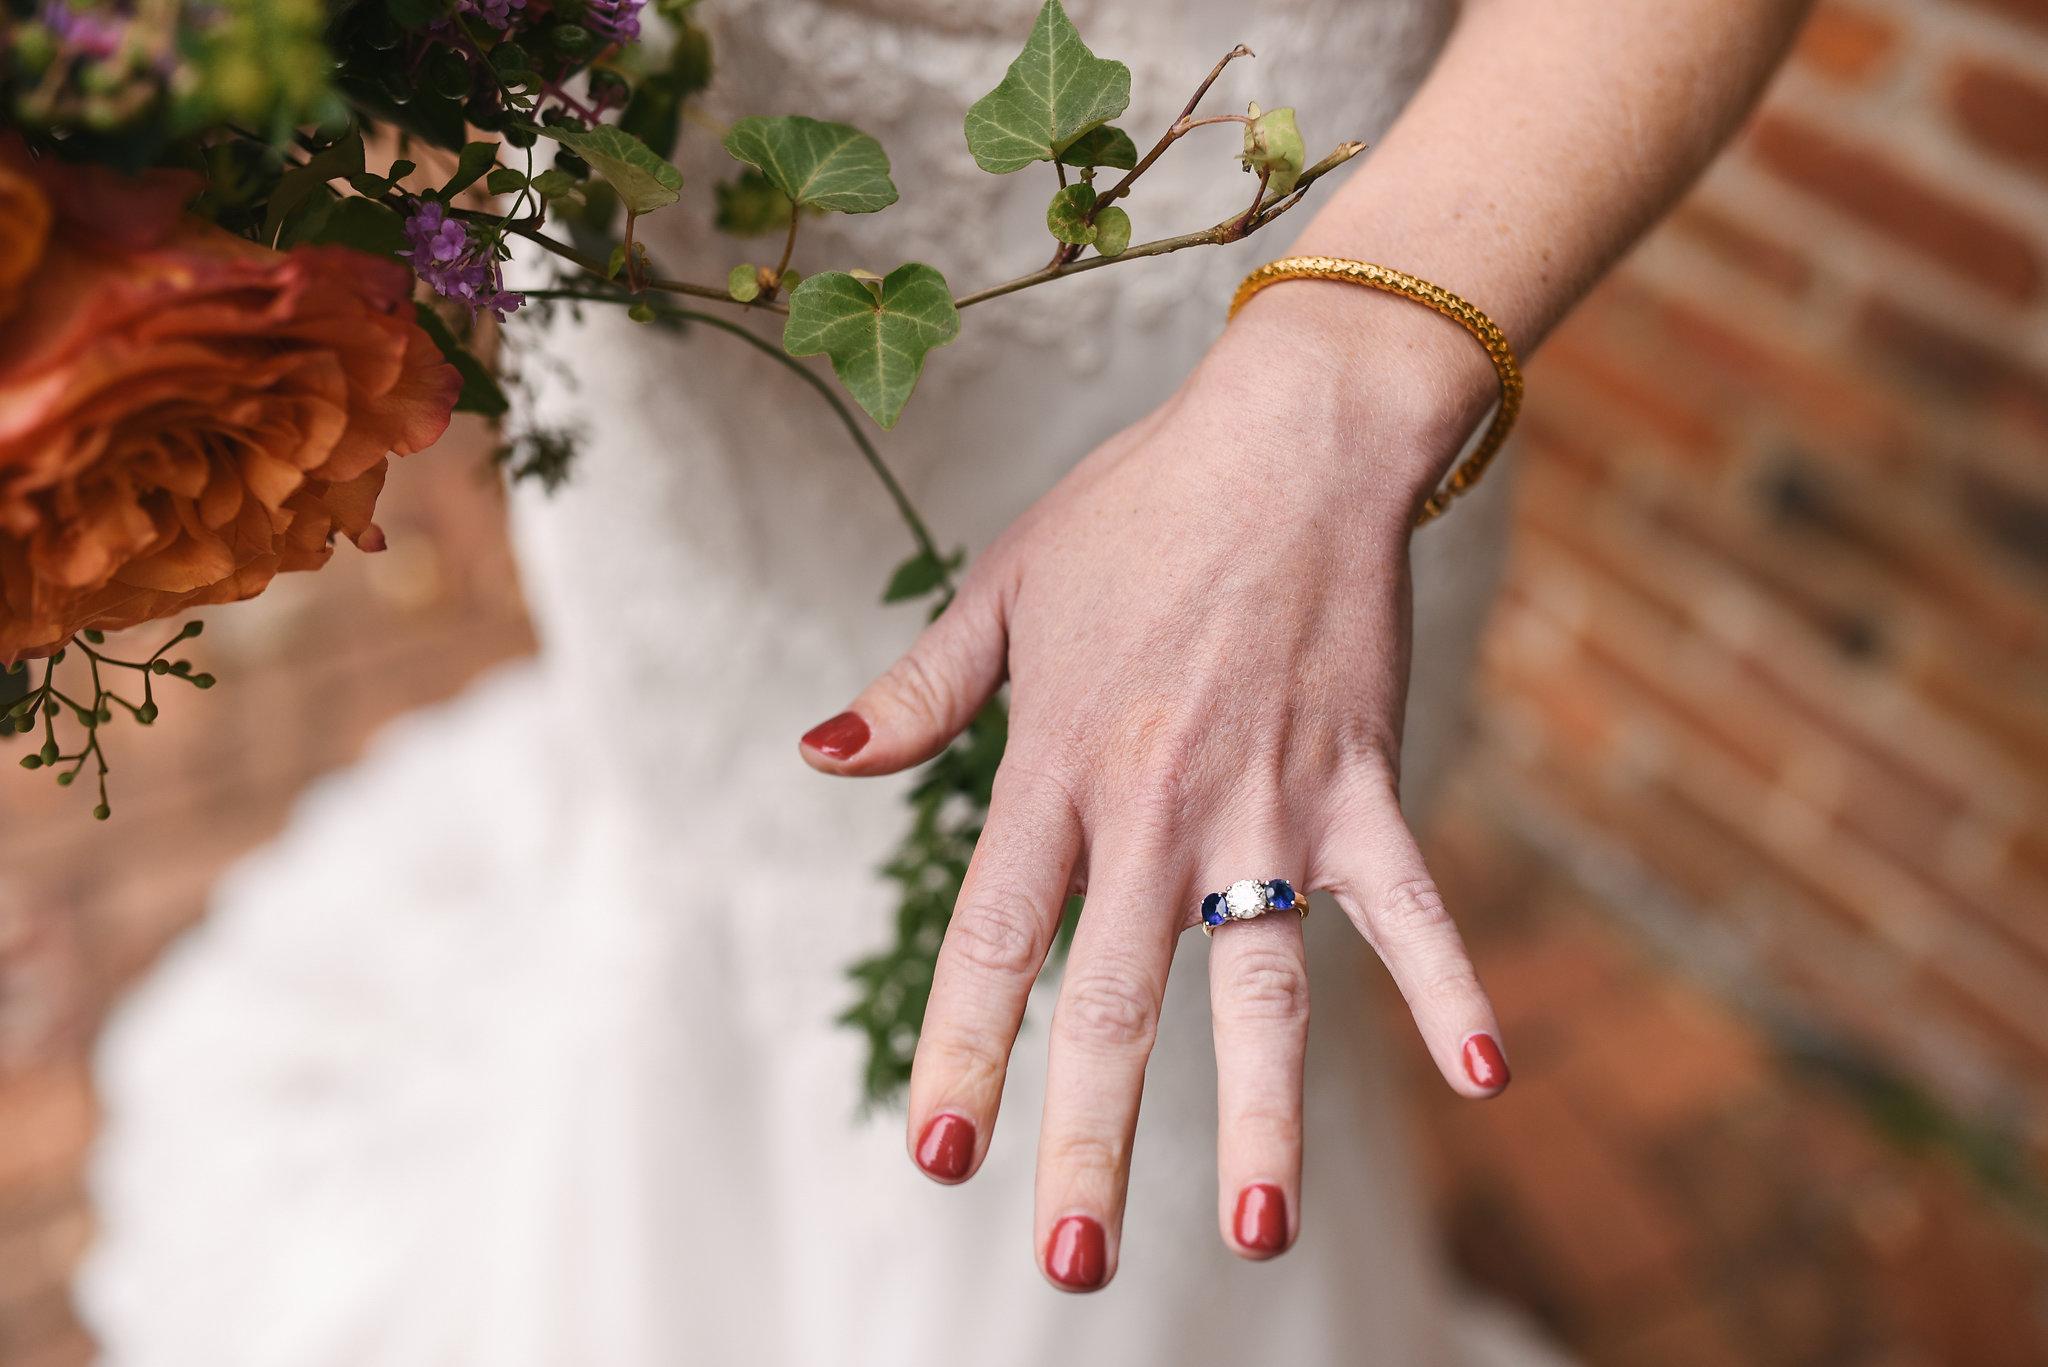 Fall Wedding, Alexandria, Wedding Jewelry, Ring Detail, Engagement Ring, Wedding Flowers, Detail Photo